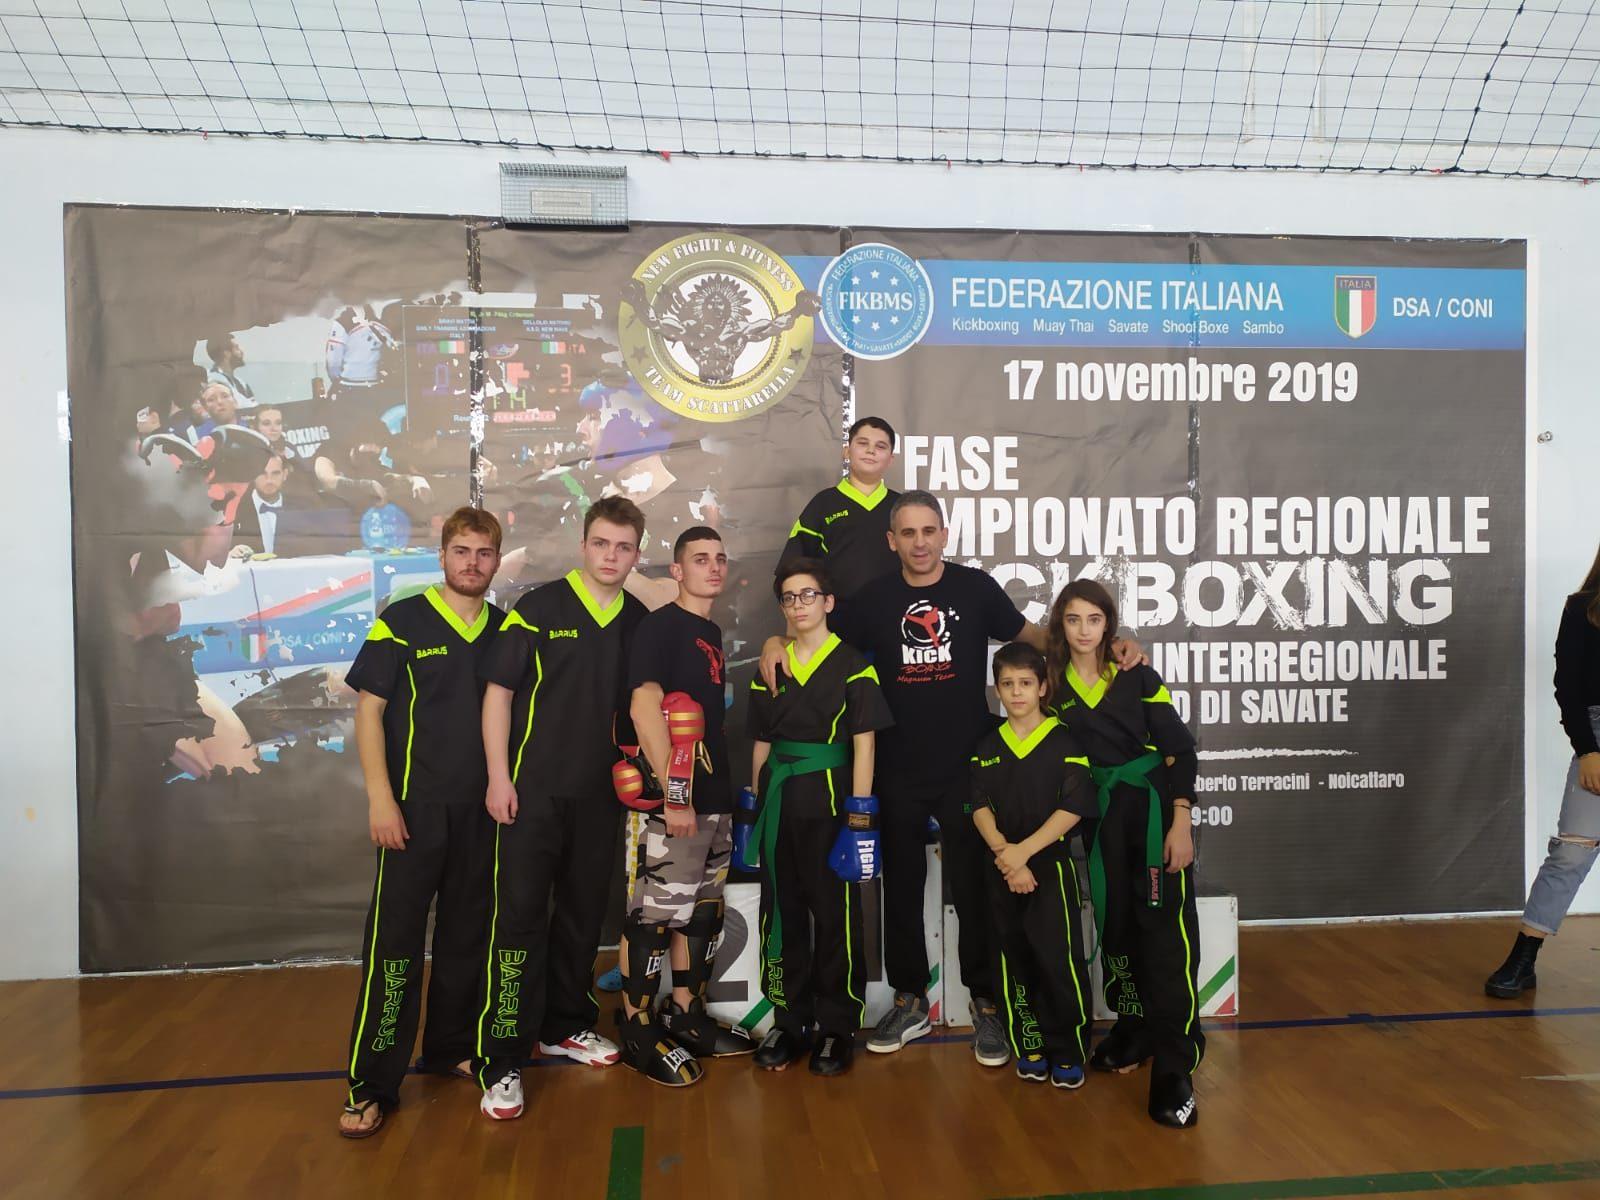 Manfredonia. Campionato regionale kickboxing Fikbms, Noicattaro: Magnum prevale - StatoQuotidiano.it